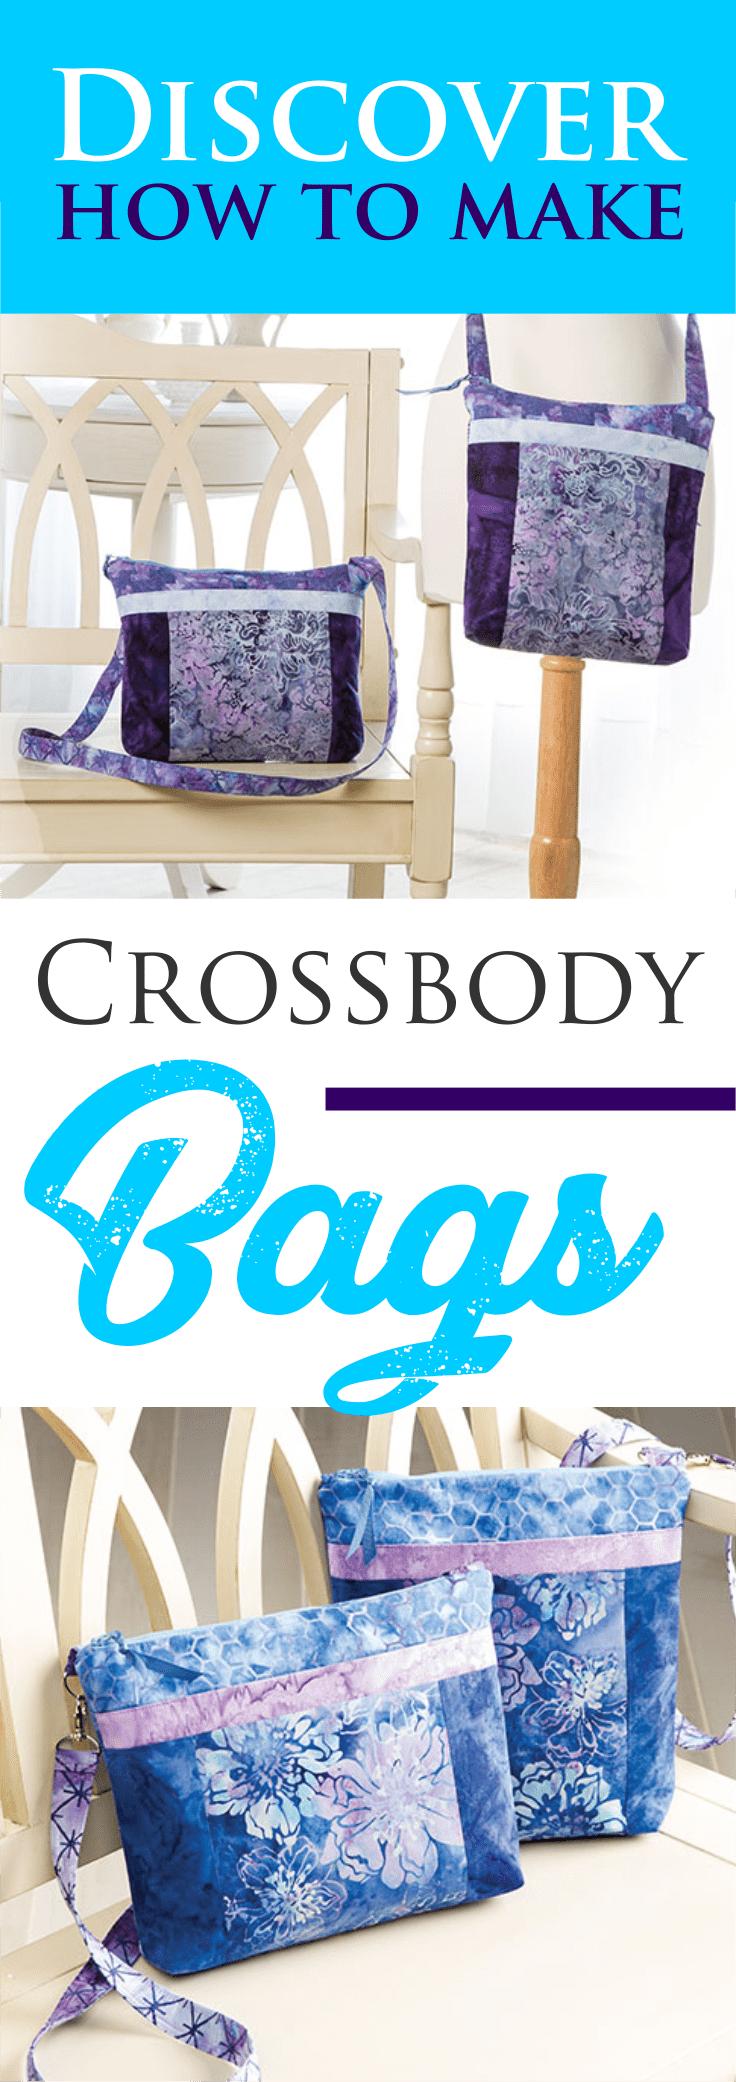 How to Make a Crossbody Hobo Bag